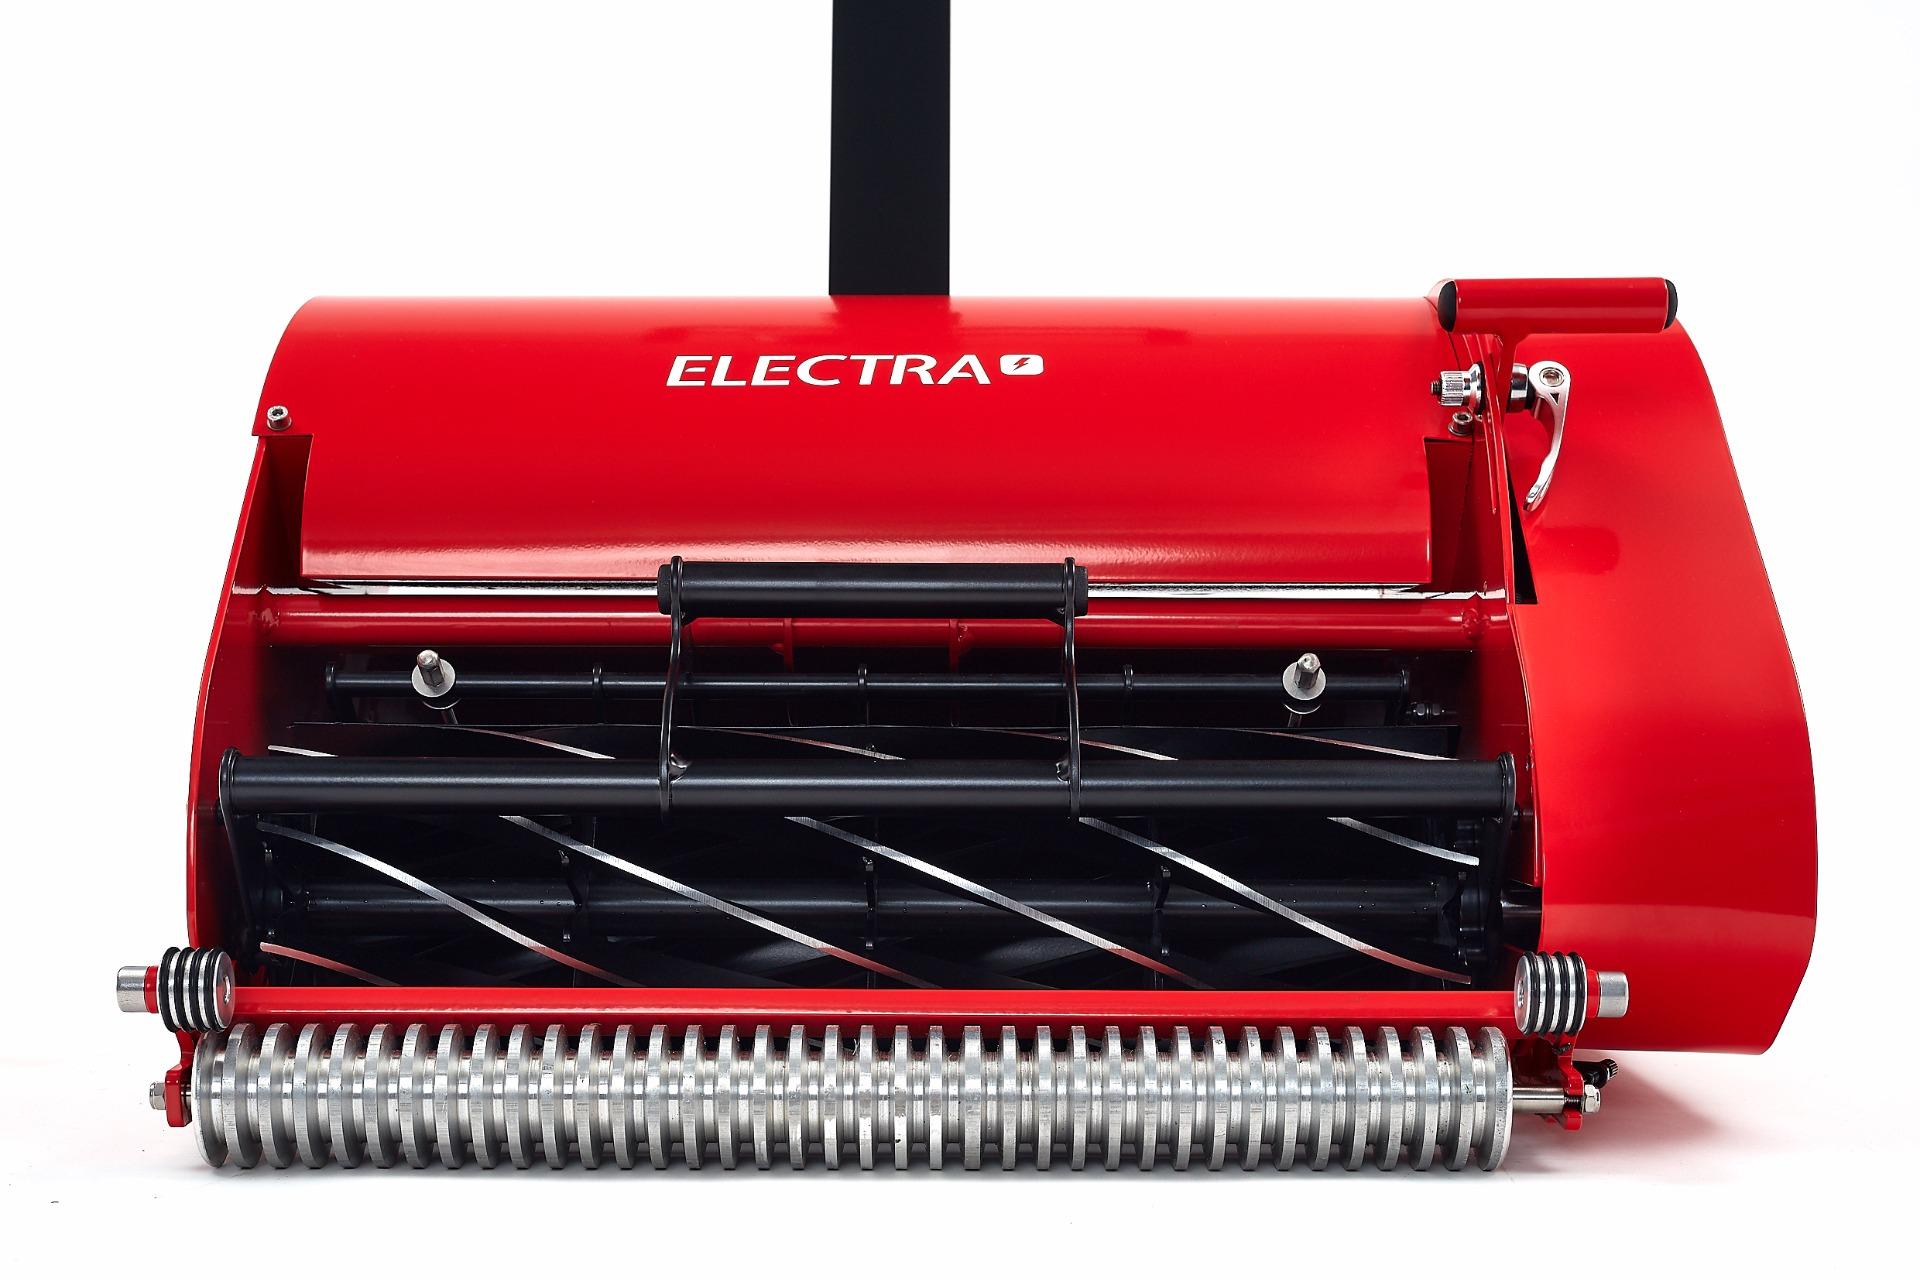 accu cordless model Electra lawn mower